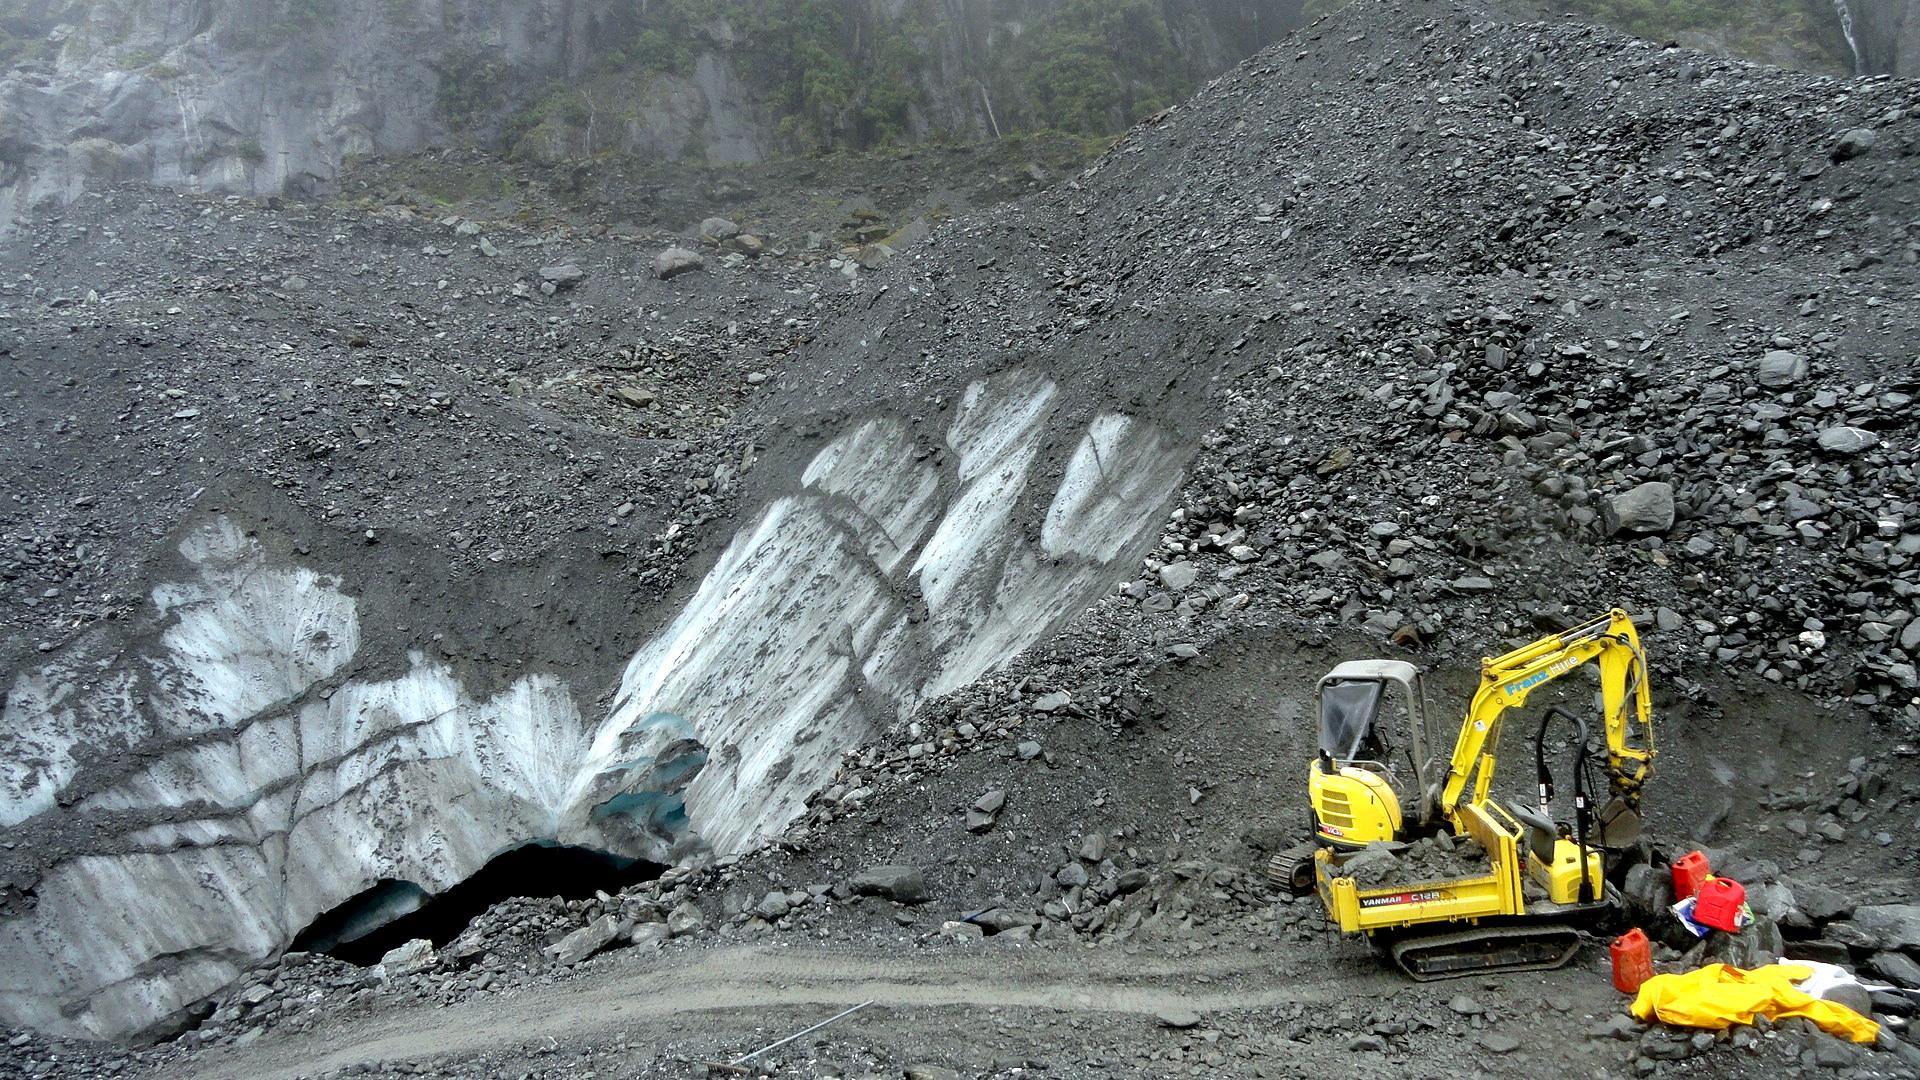 FJ Glacier Ice Cave & Equipment